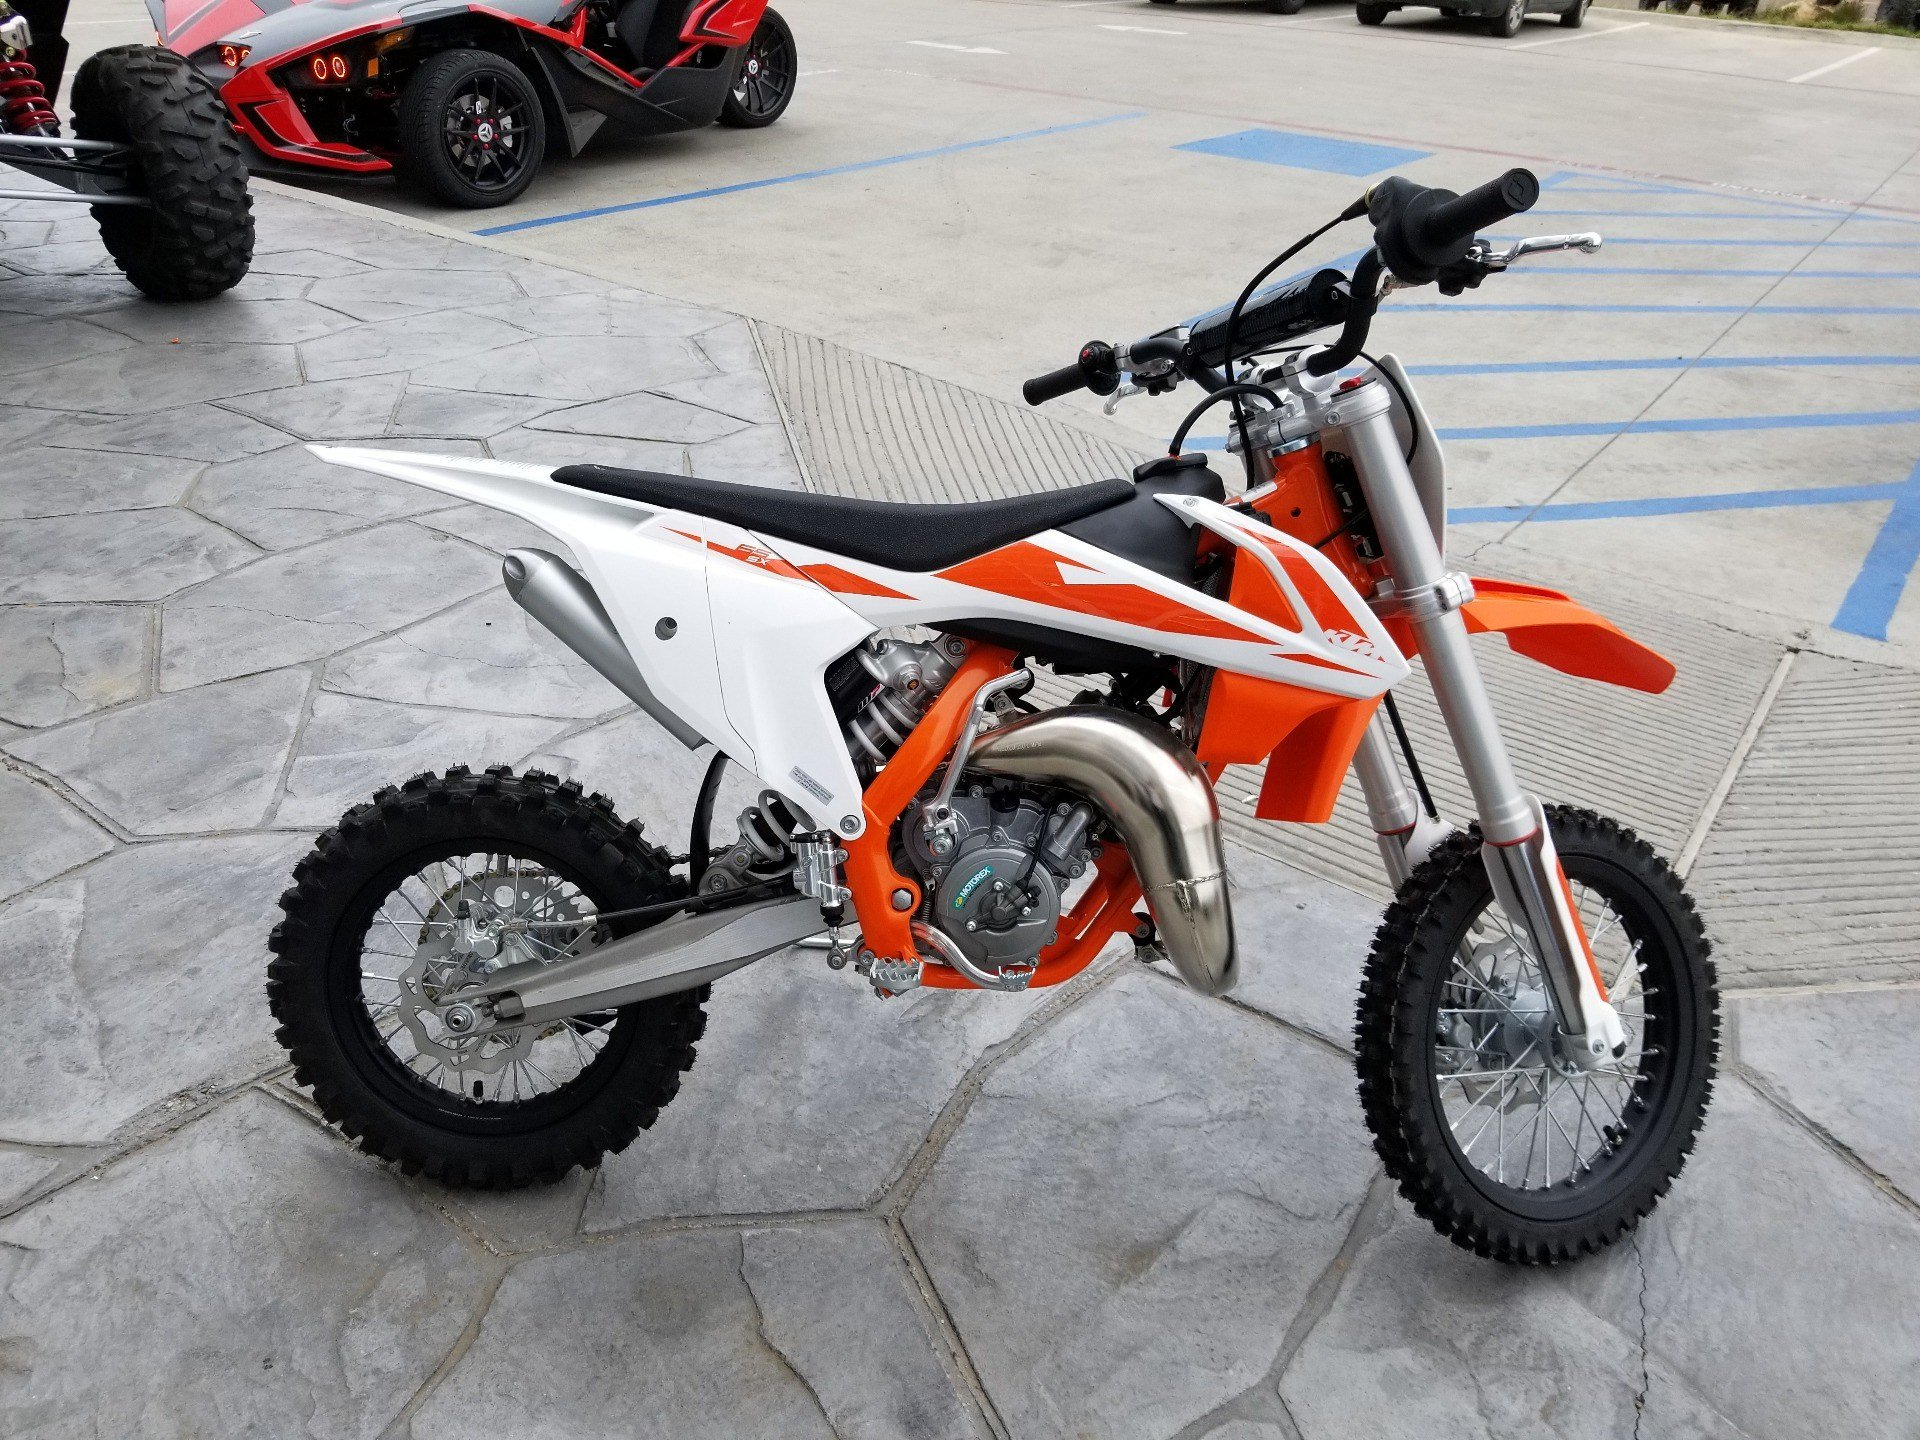 2019 Ktm 65 Sx In Laredo Texas